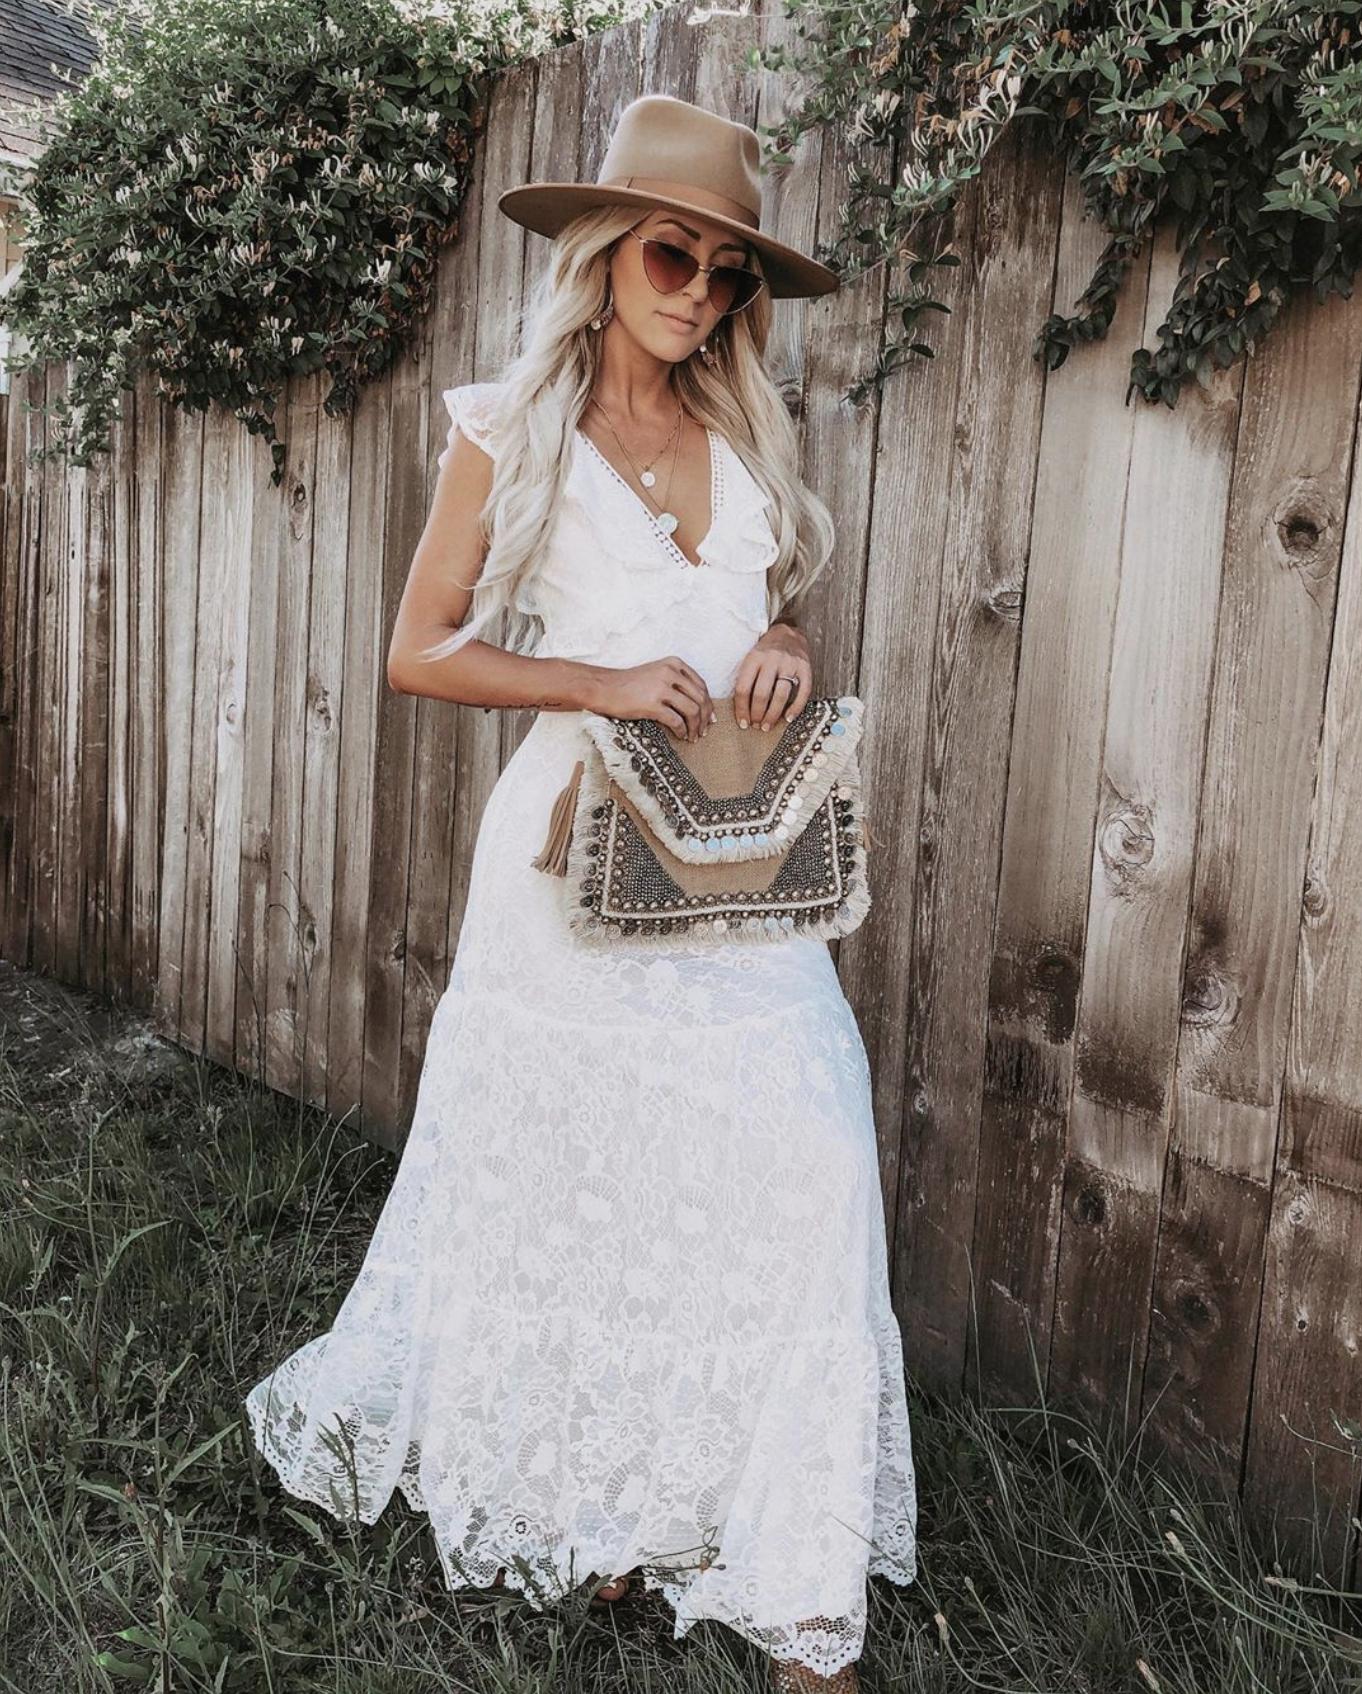 Vici Emilyrosehannon Off White Lace Dress Tiered Maxi Dress Maxi Dress [ 1694 x 1362 Pixel ]